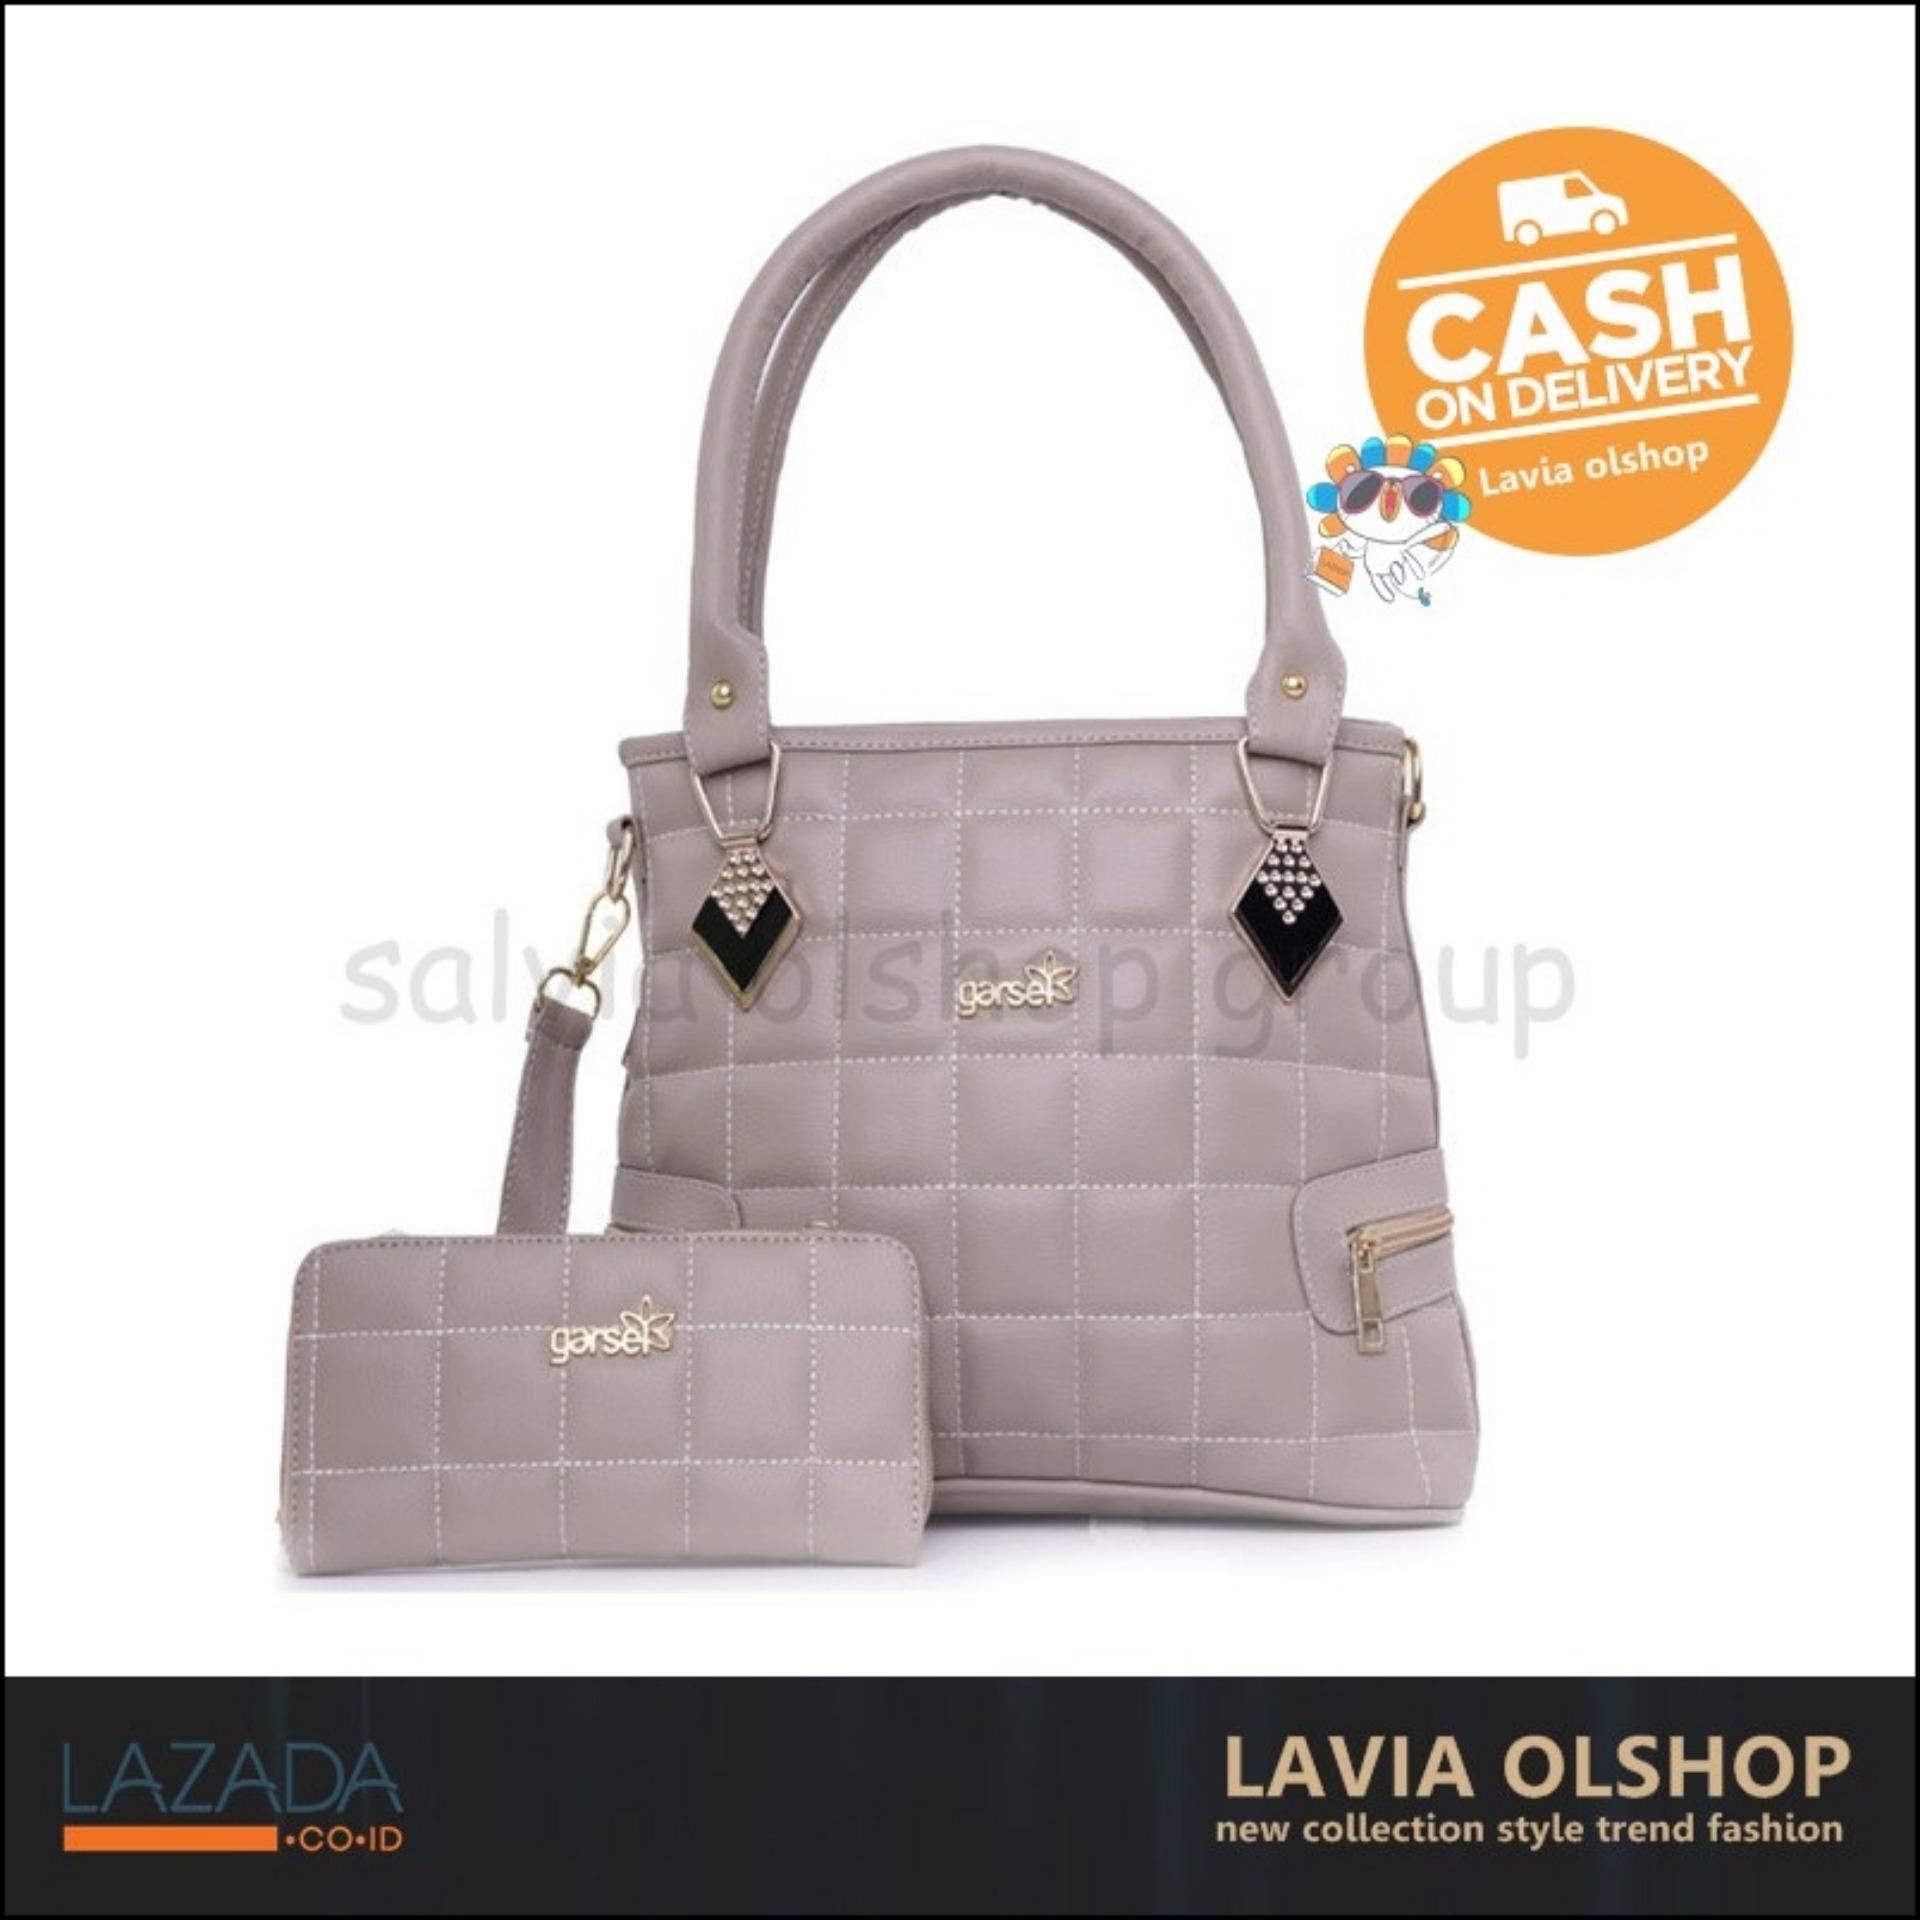 Fashion Tas Handbag Wanita Lucu Dan Modis Model Terbaru FKN 5235 - Krem